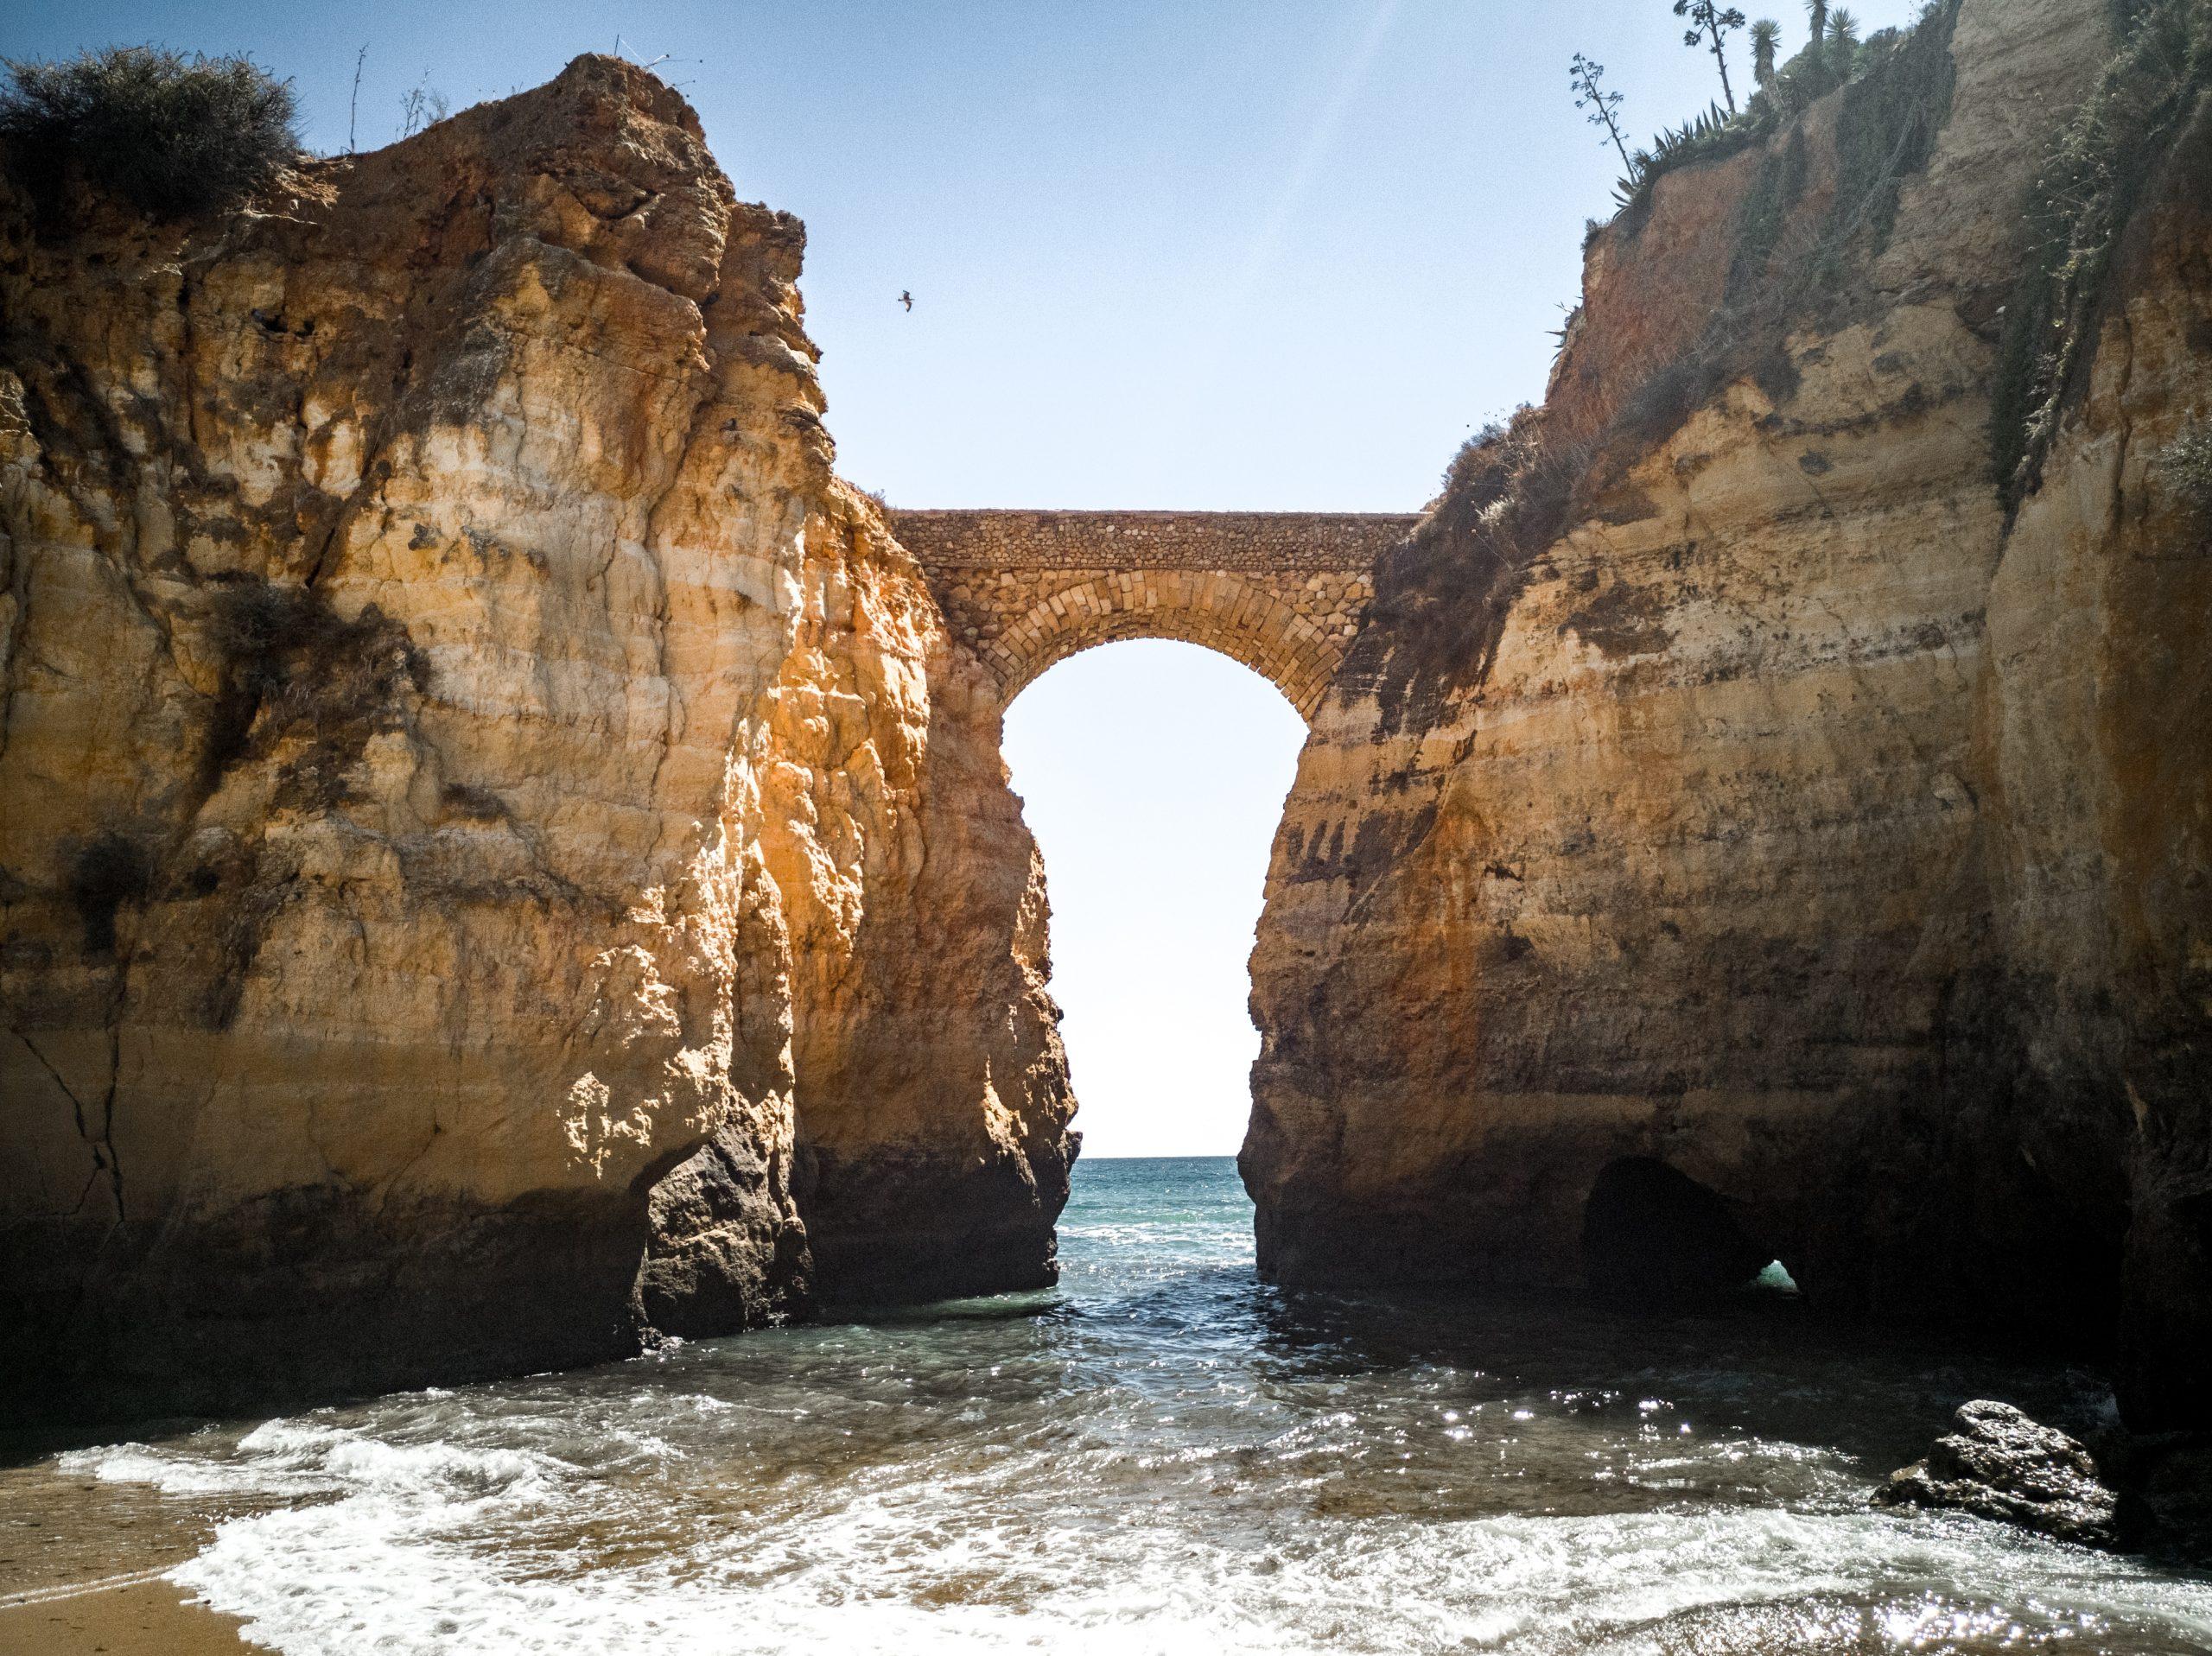 Praia-dos-Estudantes-le-spiagge-più-belle-dell-algarve